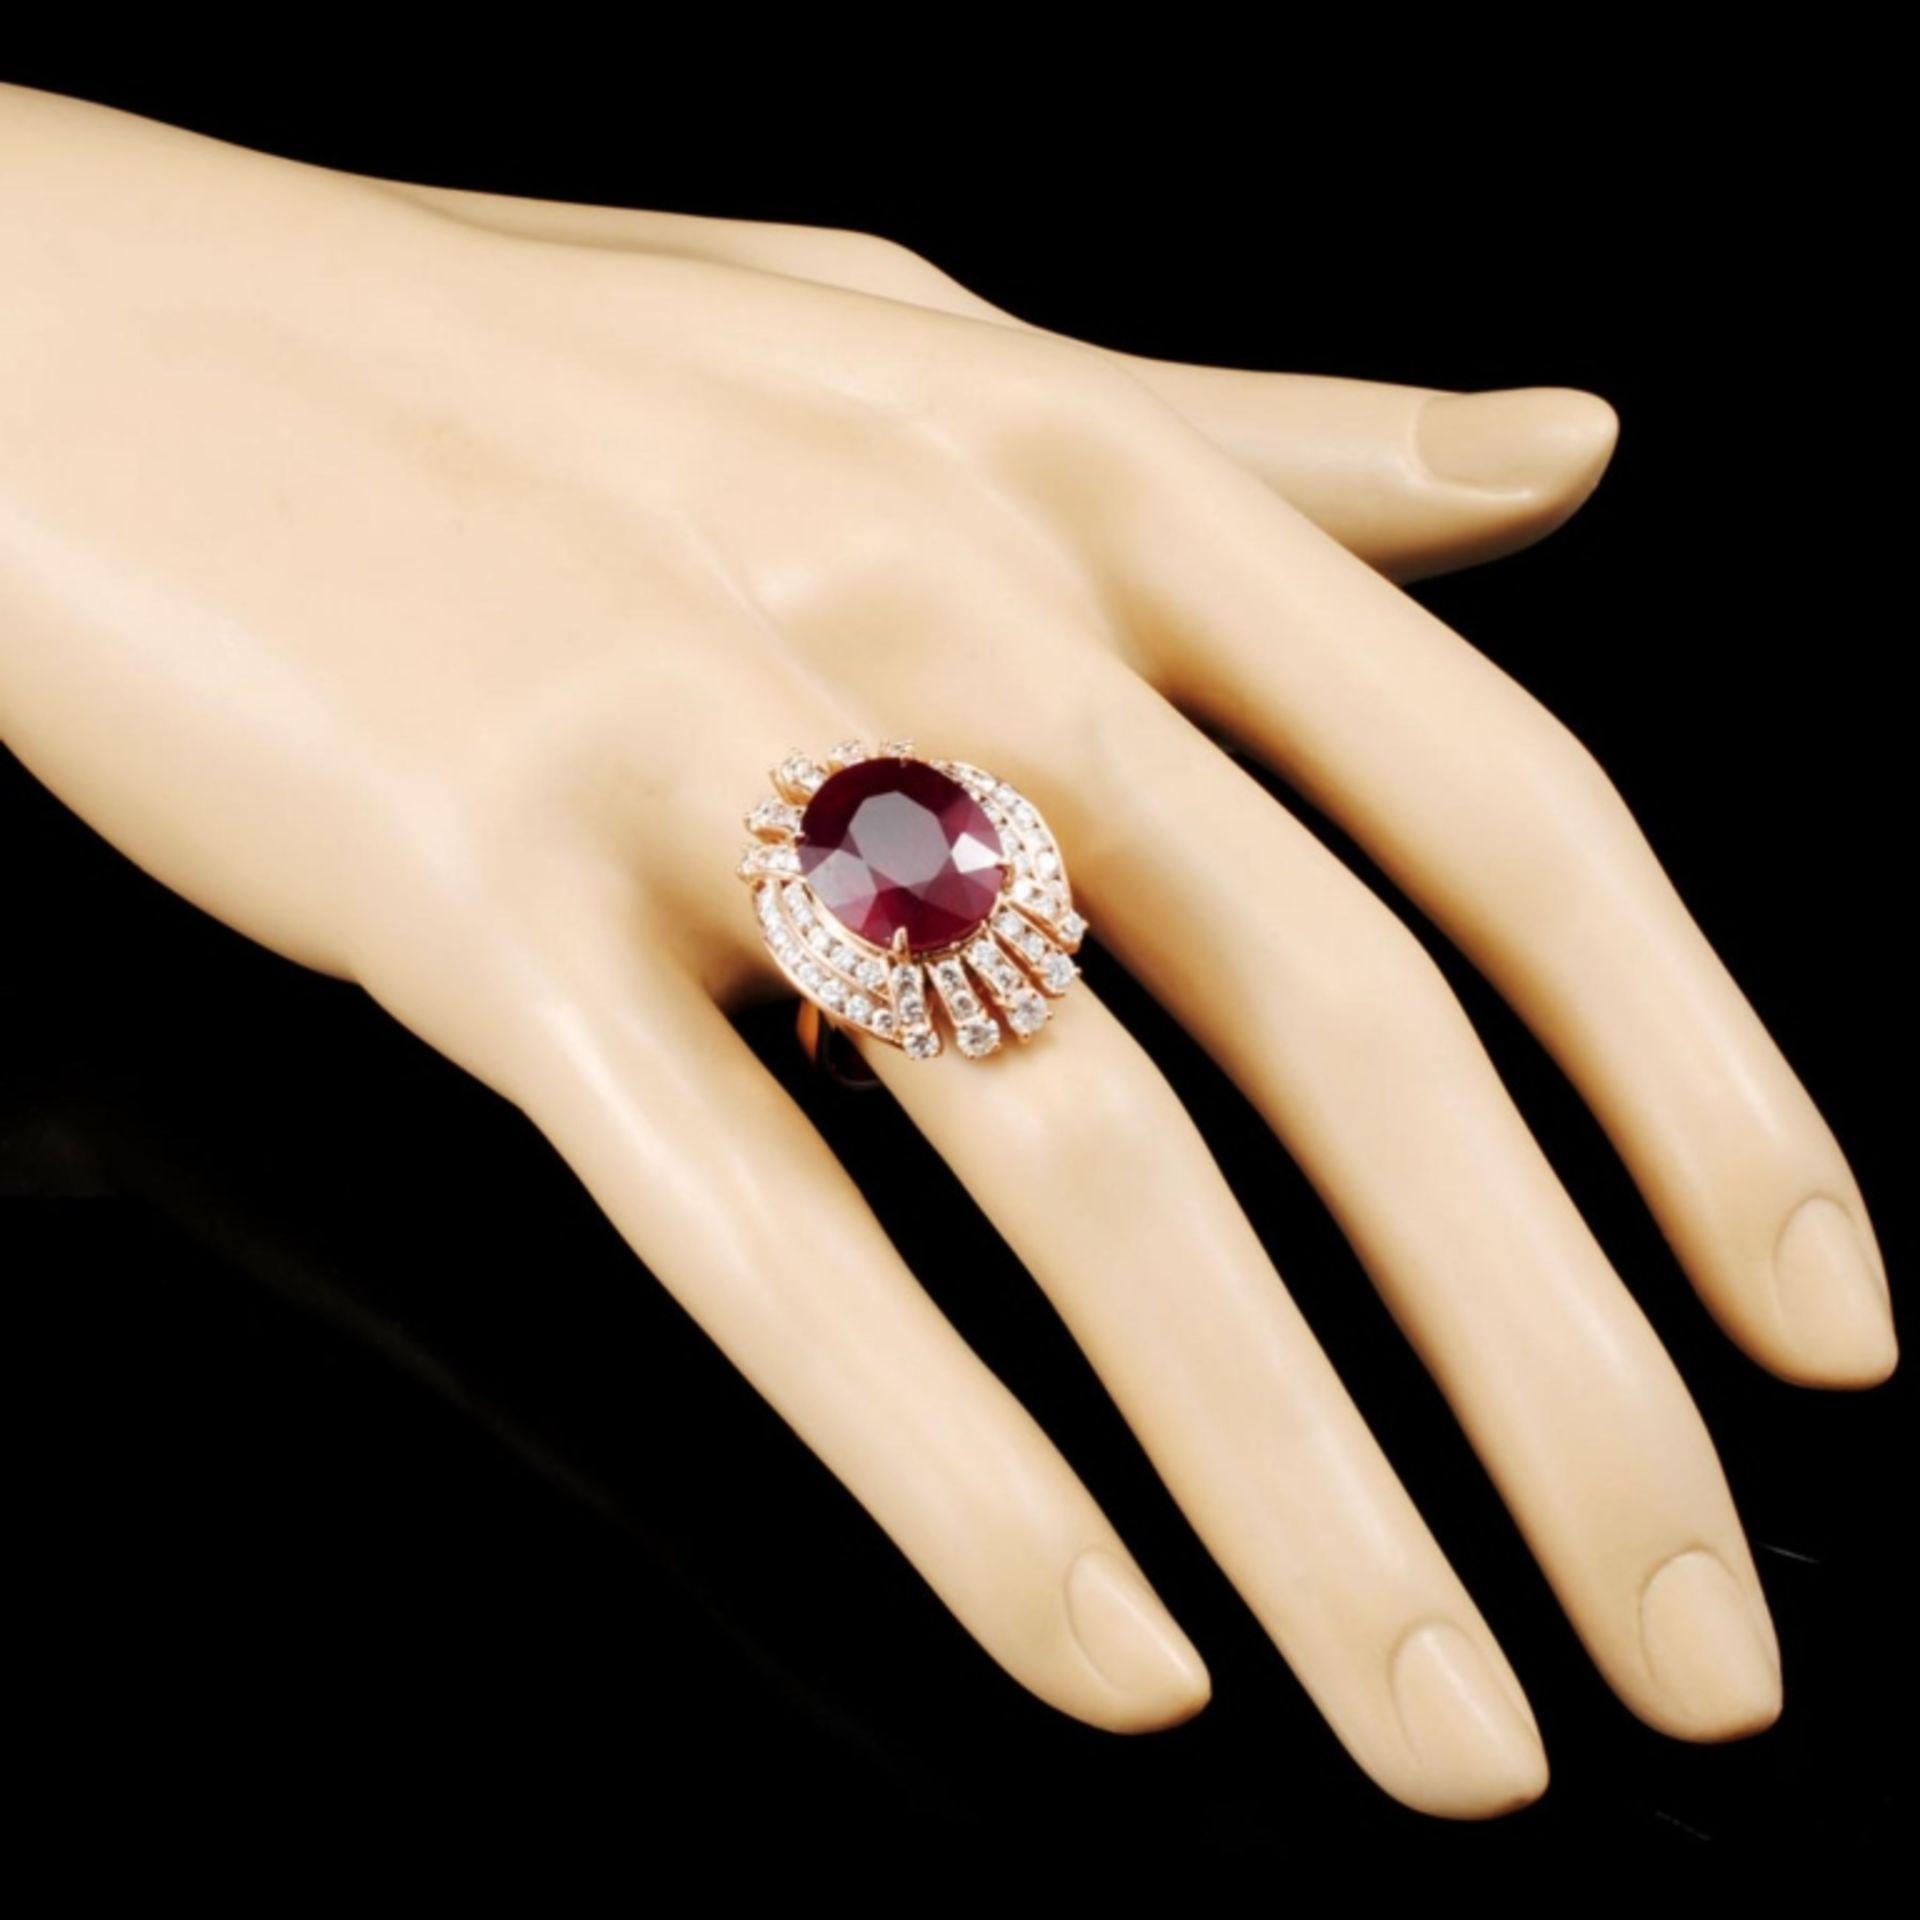 14K Gold 12.24ct Ruby & 2.02ctw Diamond Ring - Image 3 of 5